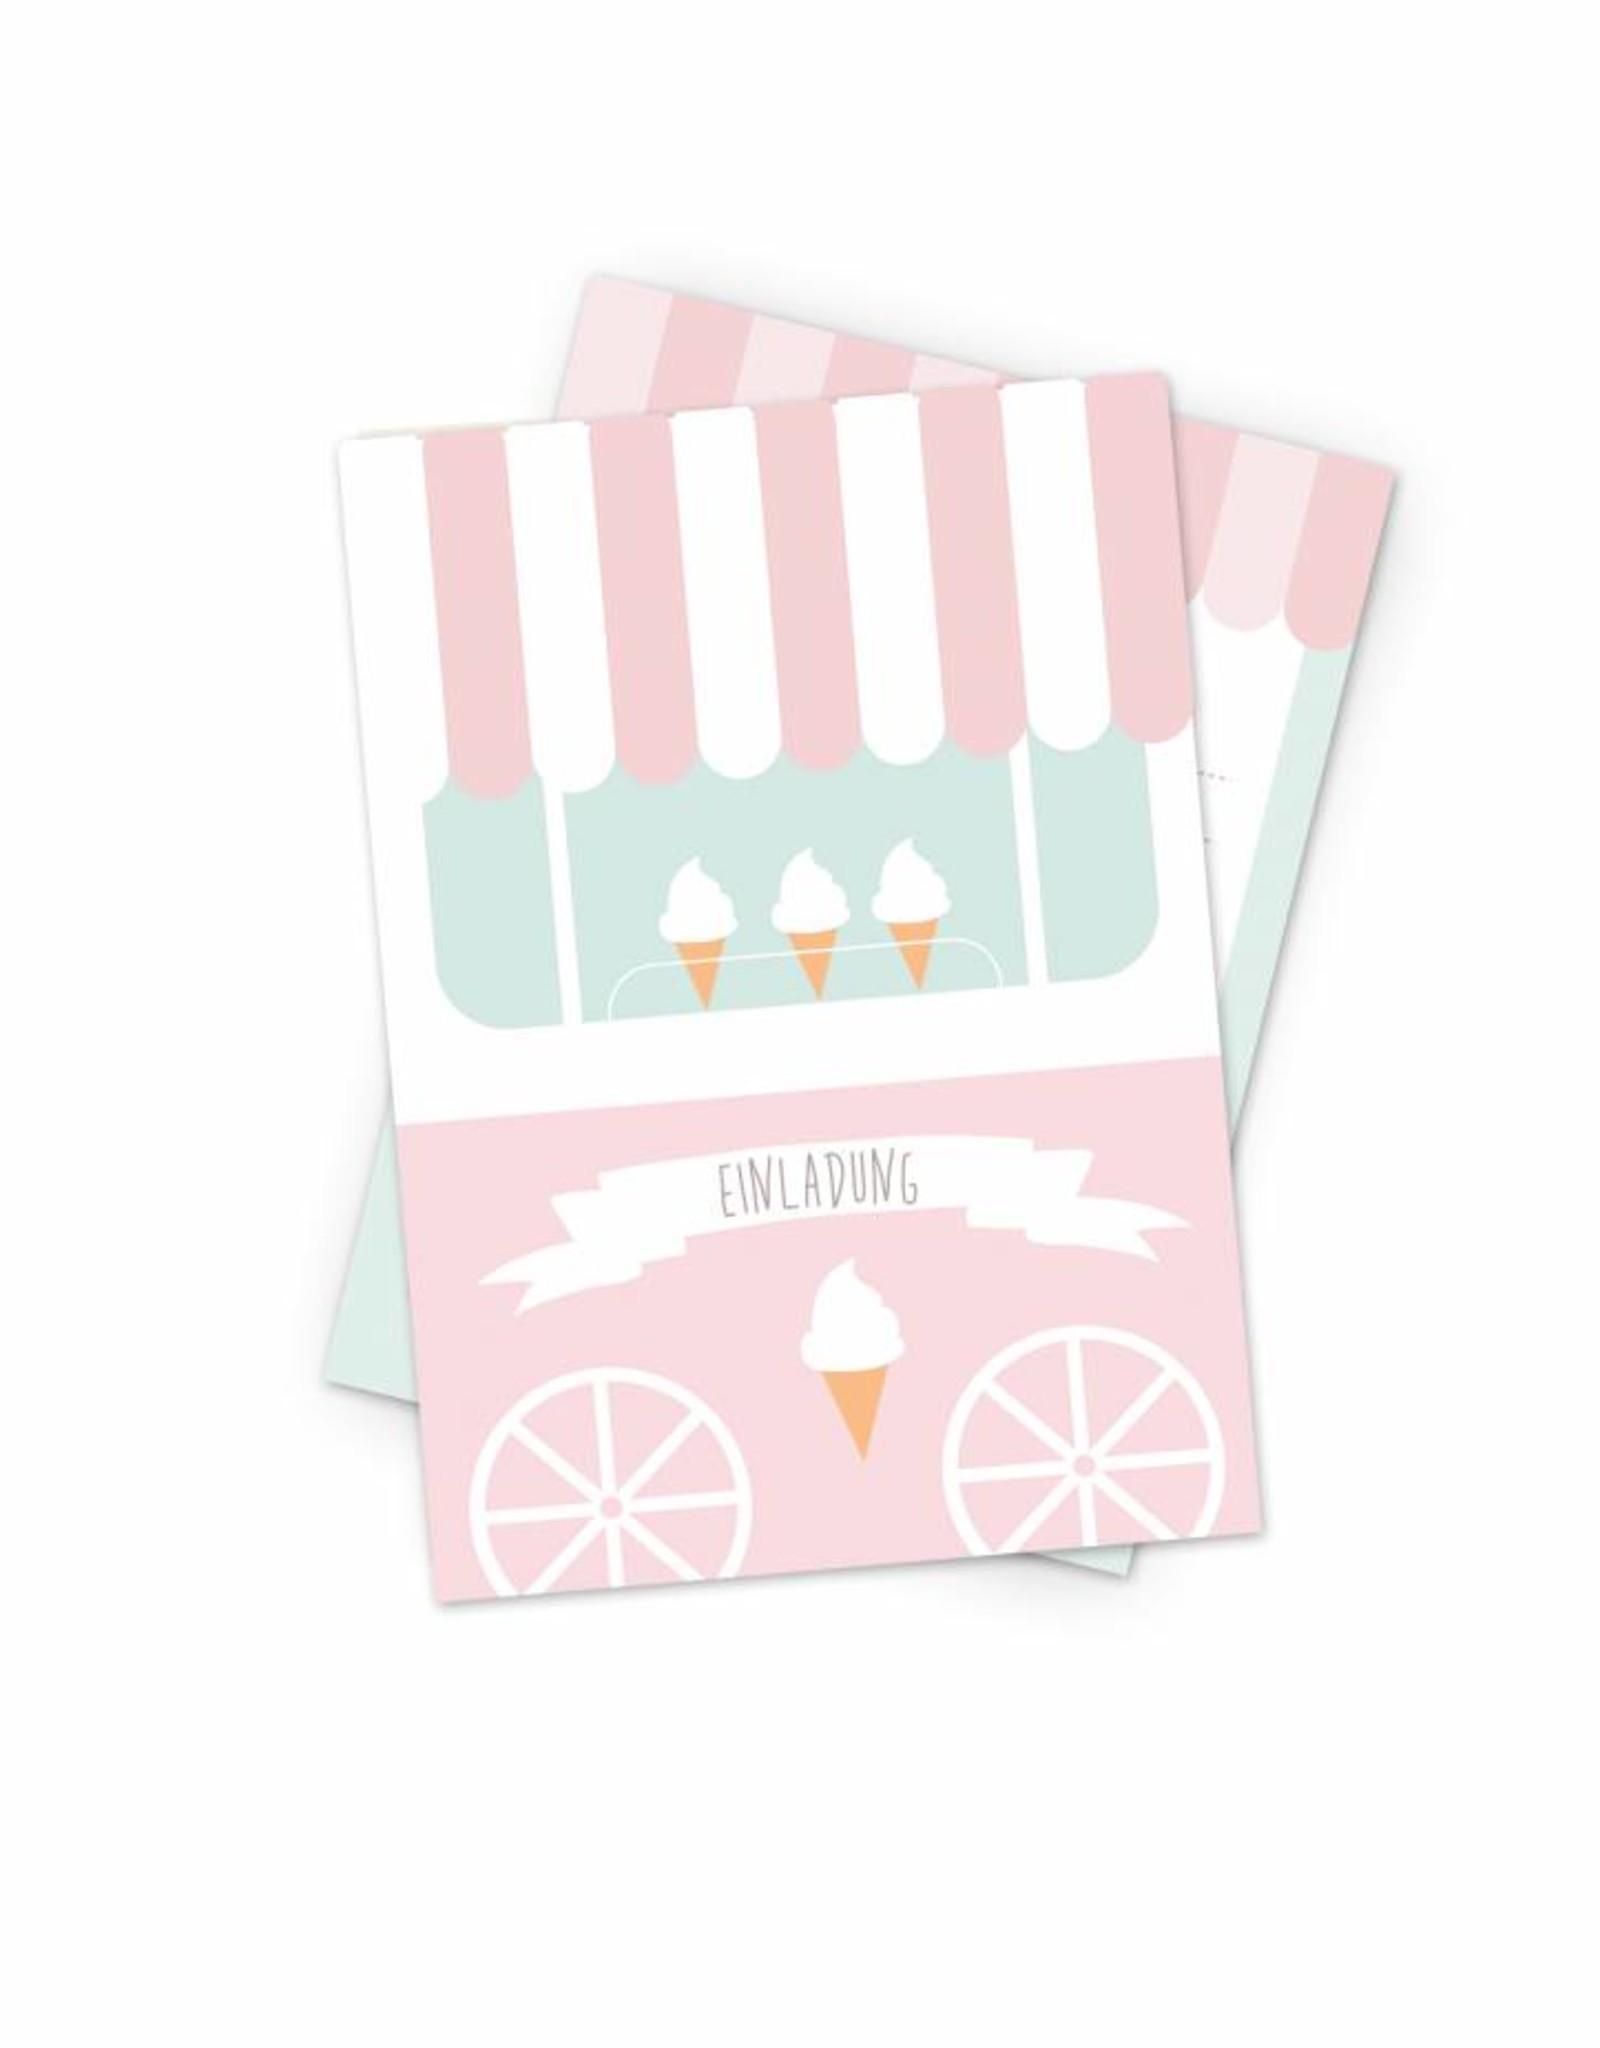 unique mimirella invitation for your next ice cream themed birthday party